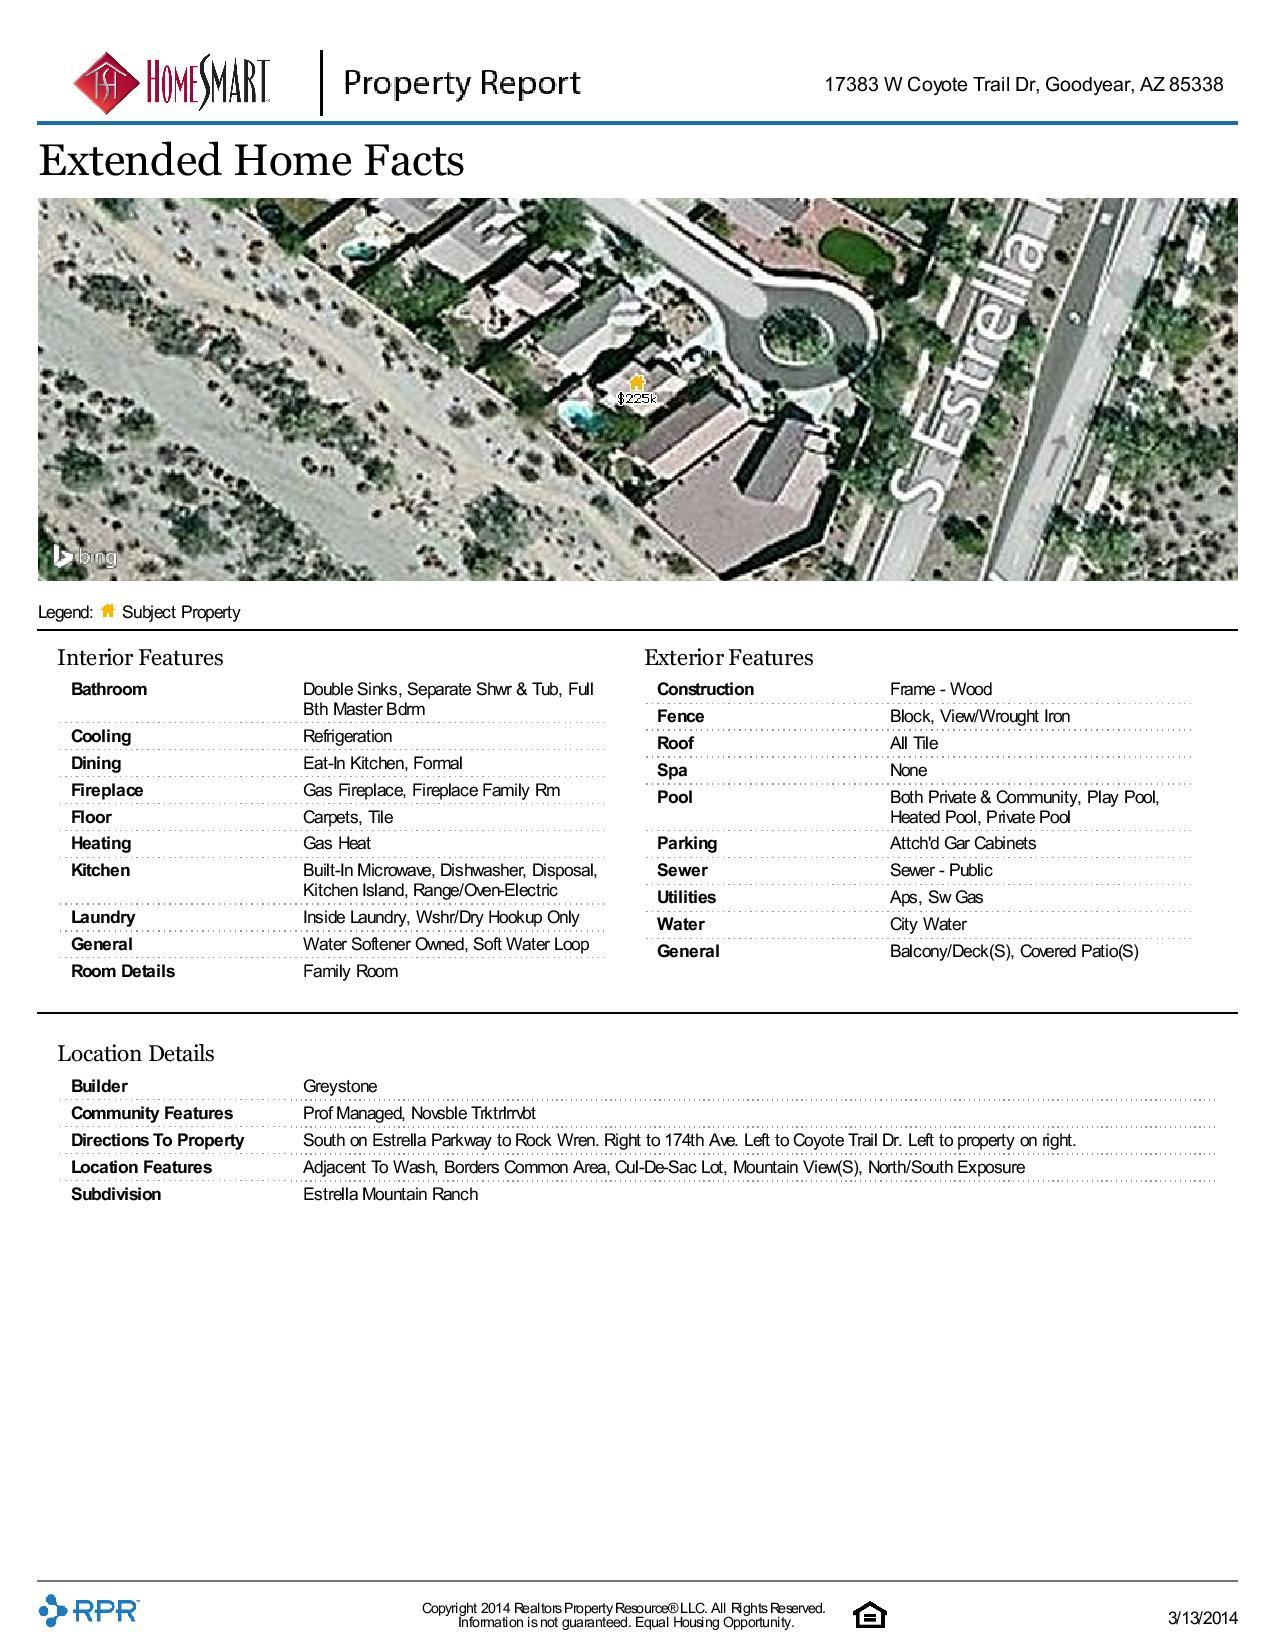 17383-W-Coyote-Trail-Dr-Goodyear-AZ-85338-page-004